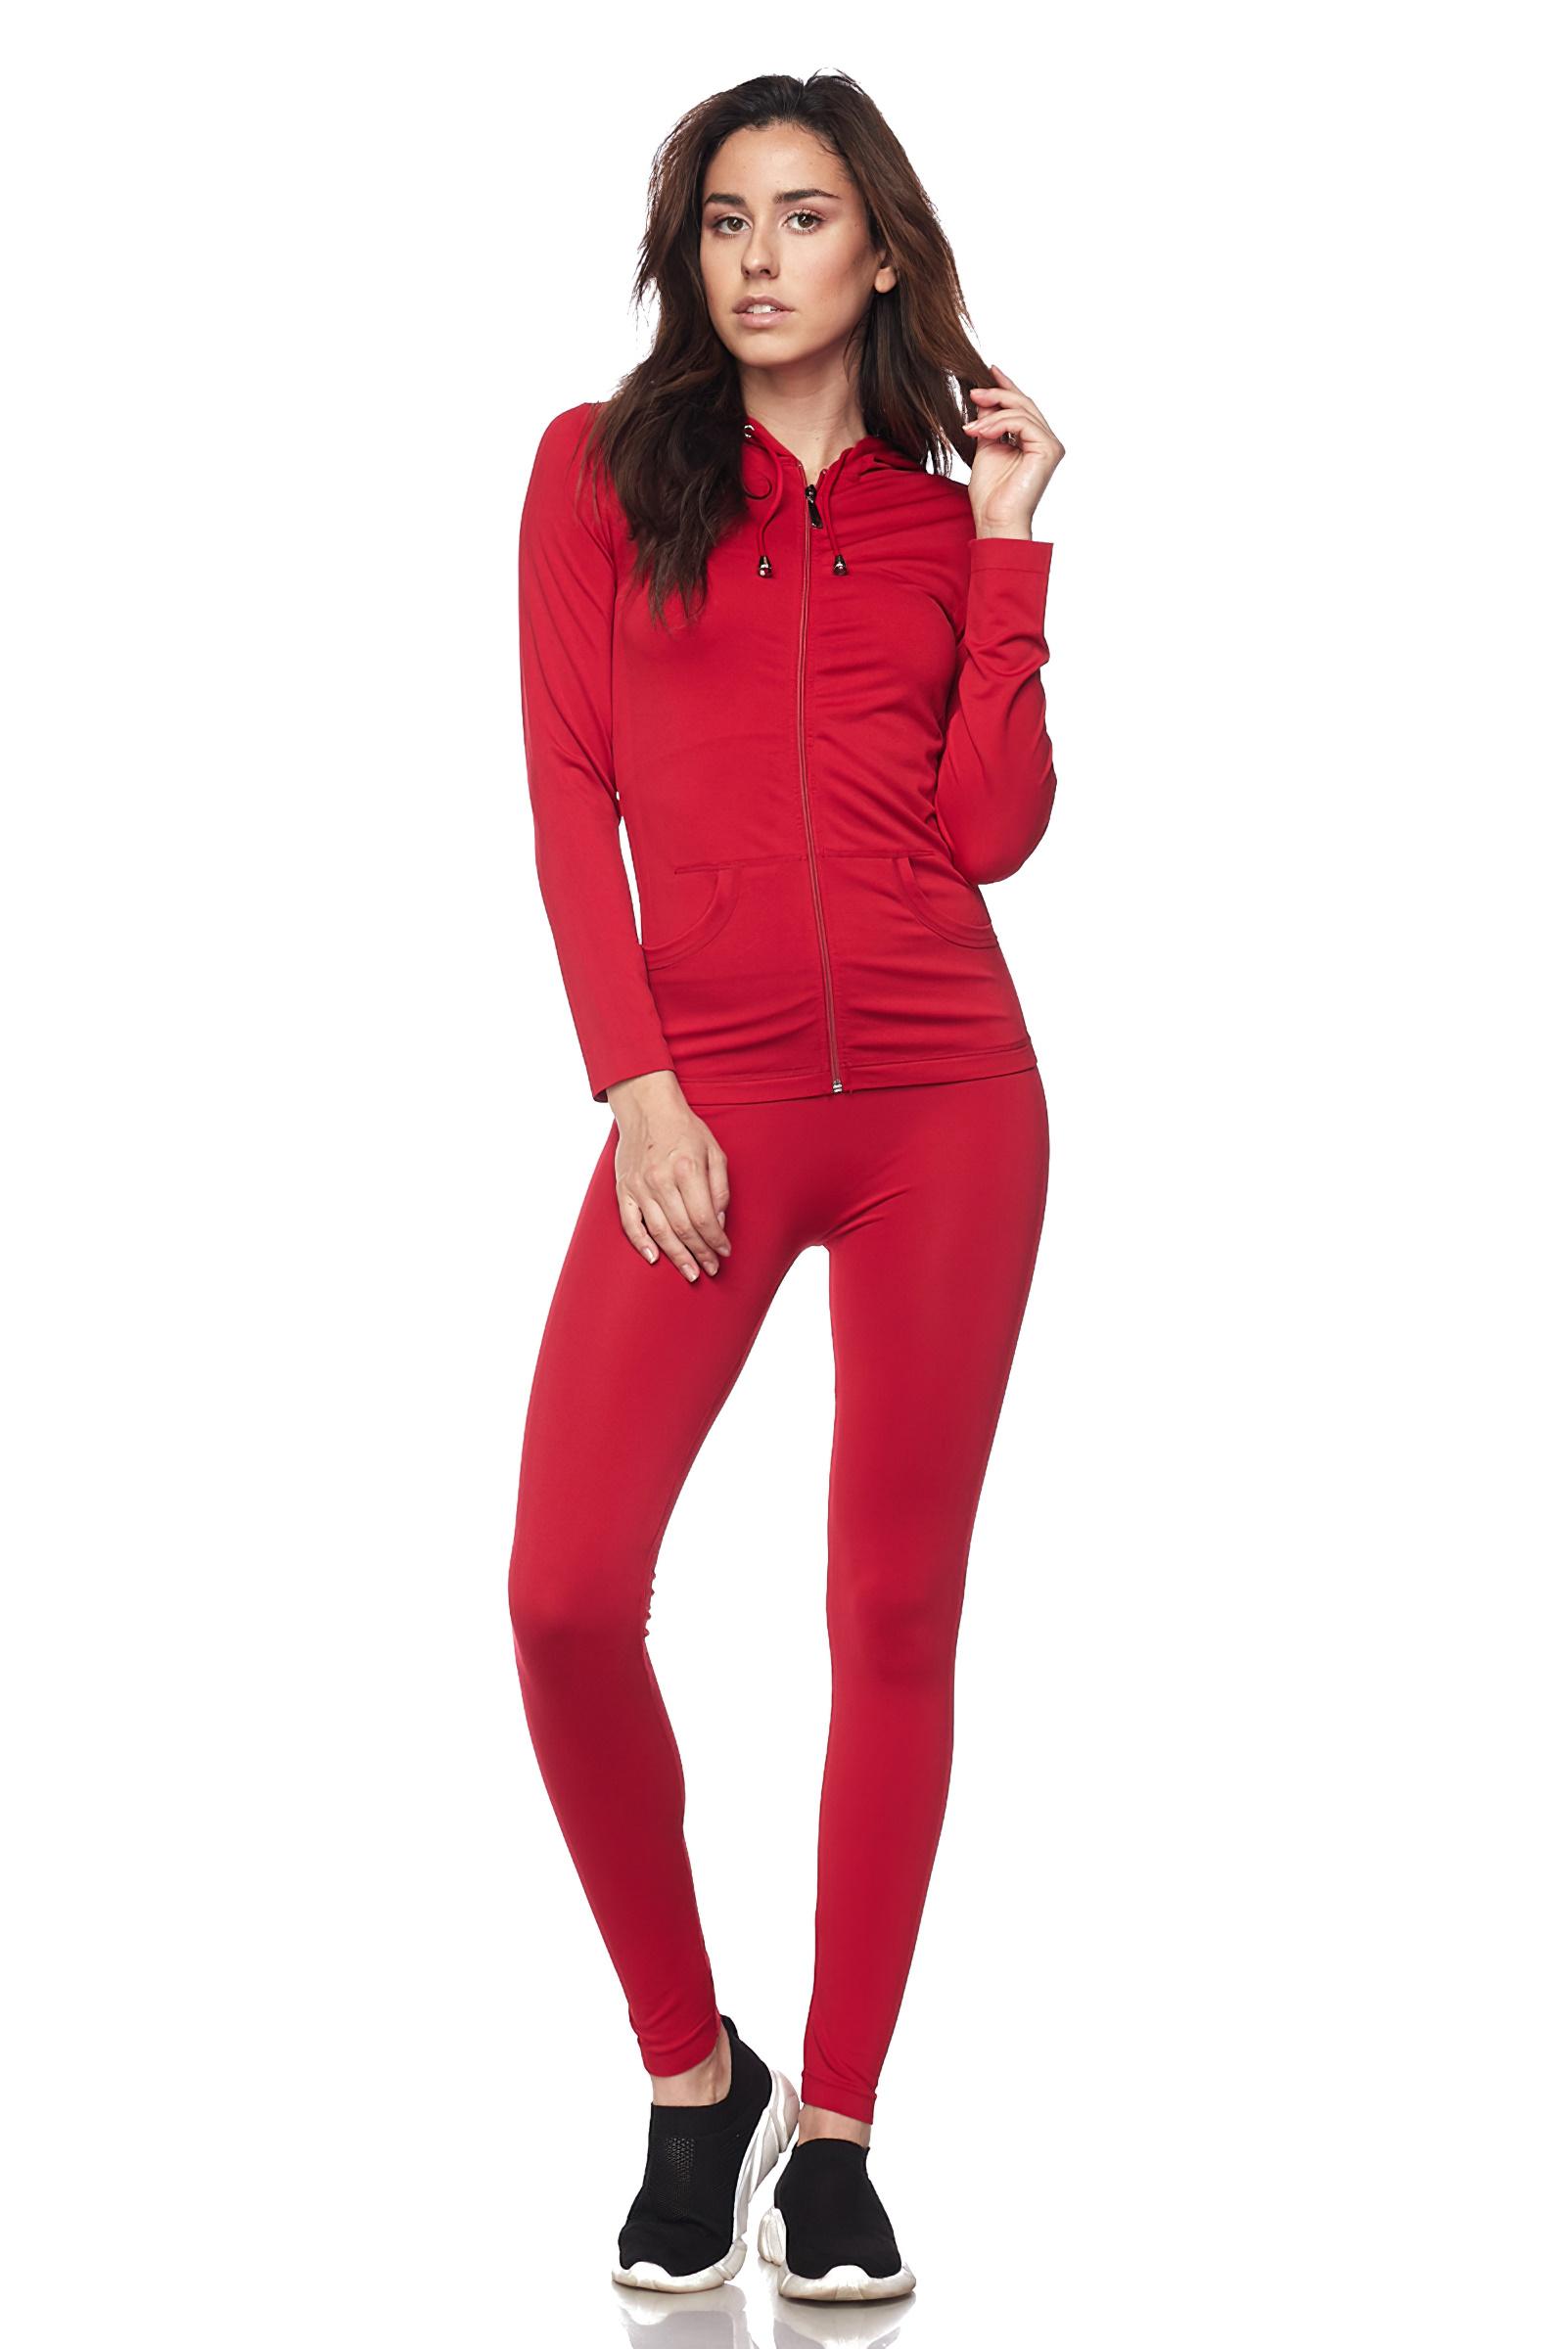 Women-039-s-Juniors-Active-Set-Wear-Zip-Up-Hoodie-and-Legging thumbnail 39